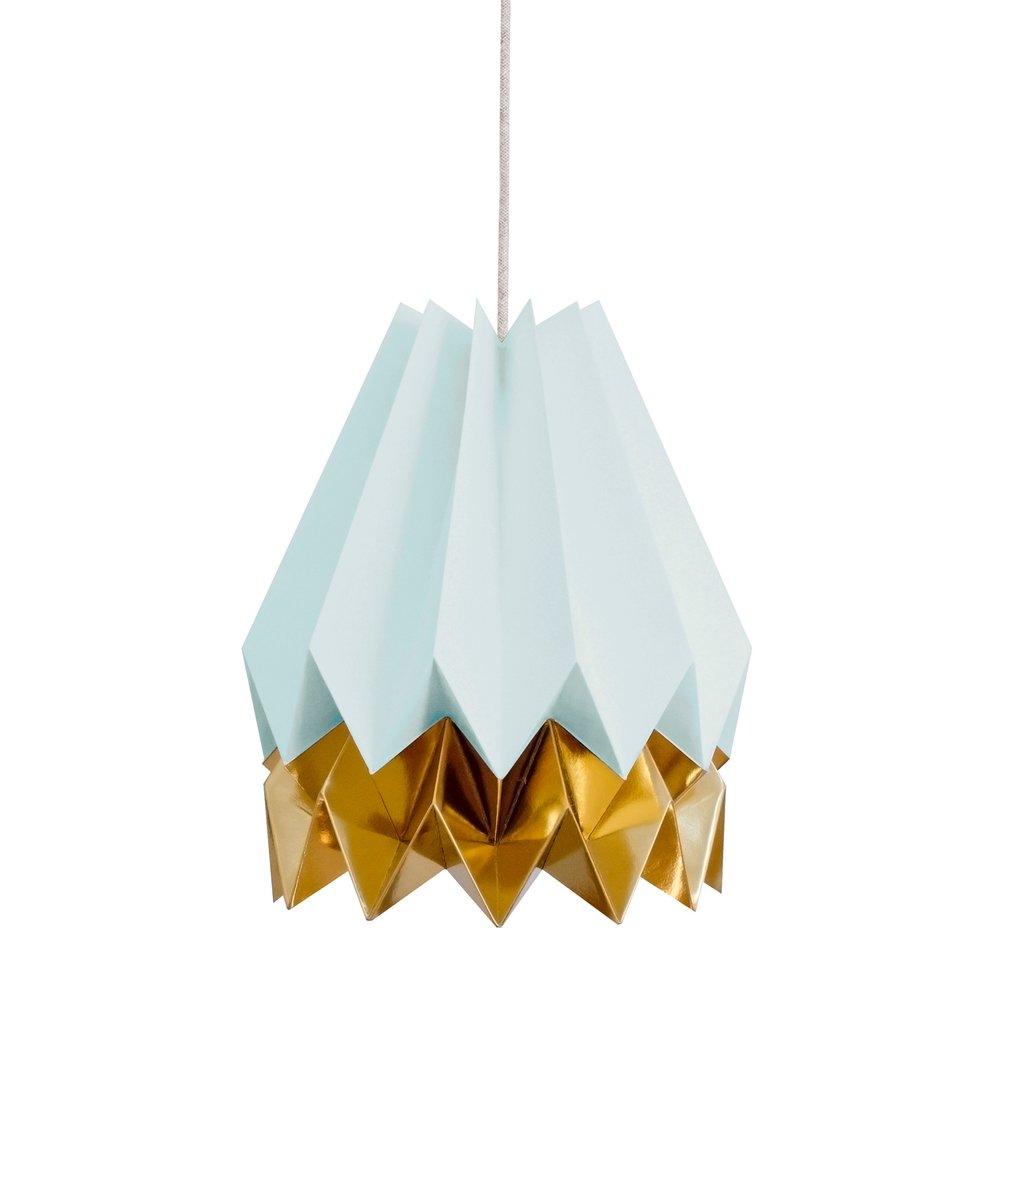 Mintblaue Origami Lampe mit goldenem Streifen von Orikomi